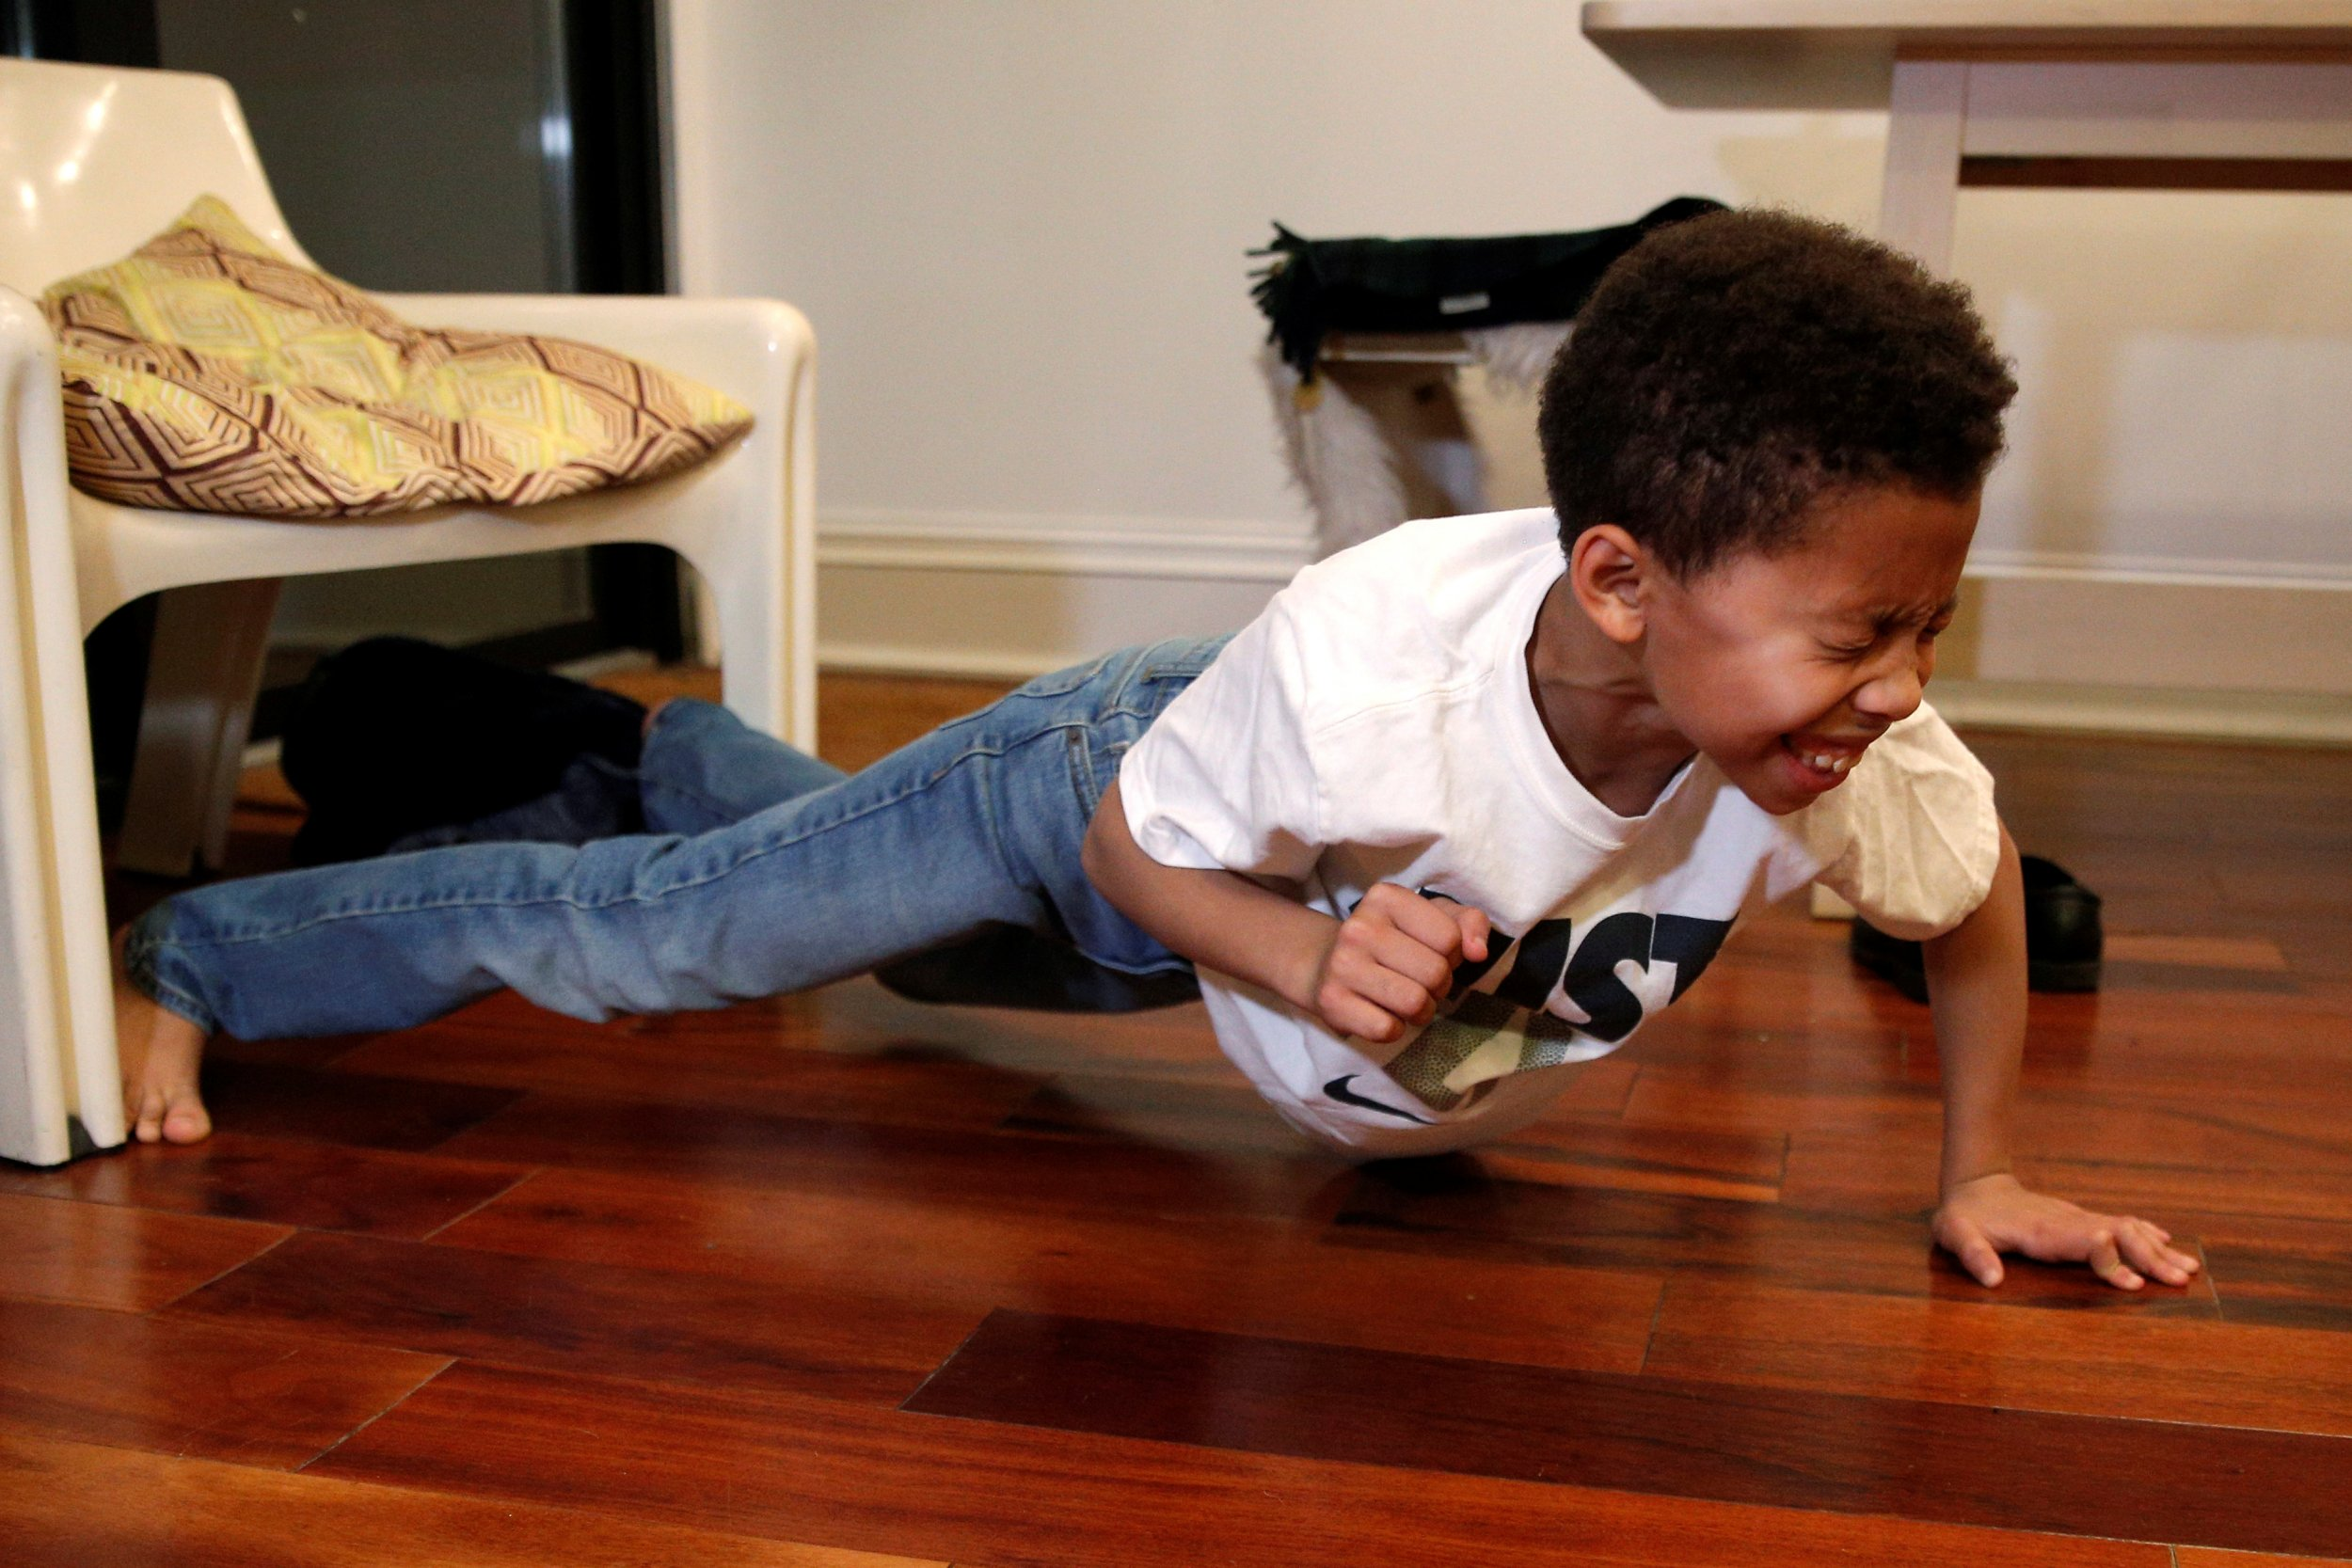 kid does push-ups